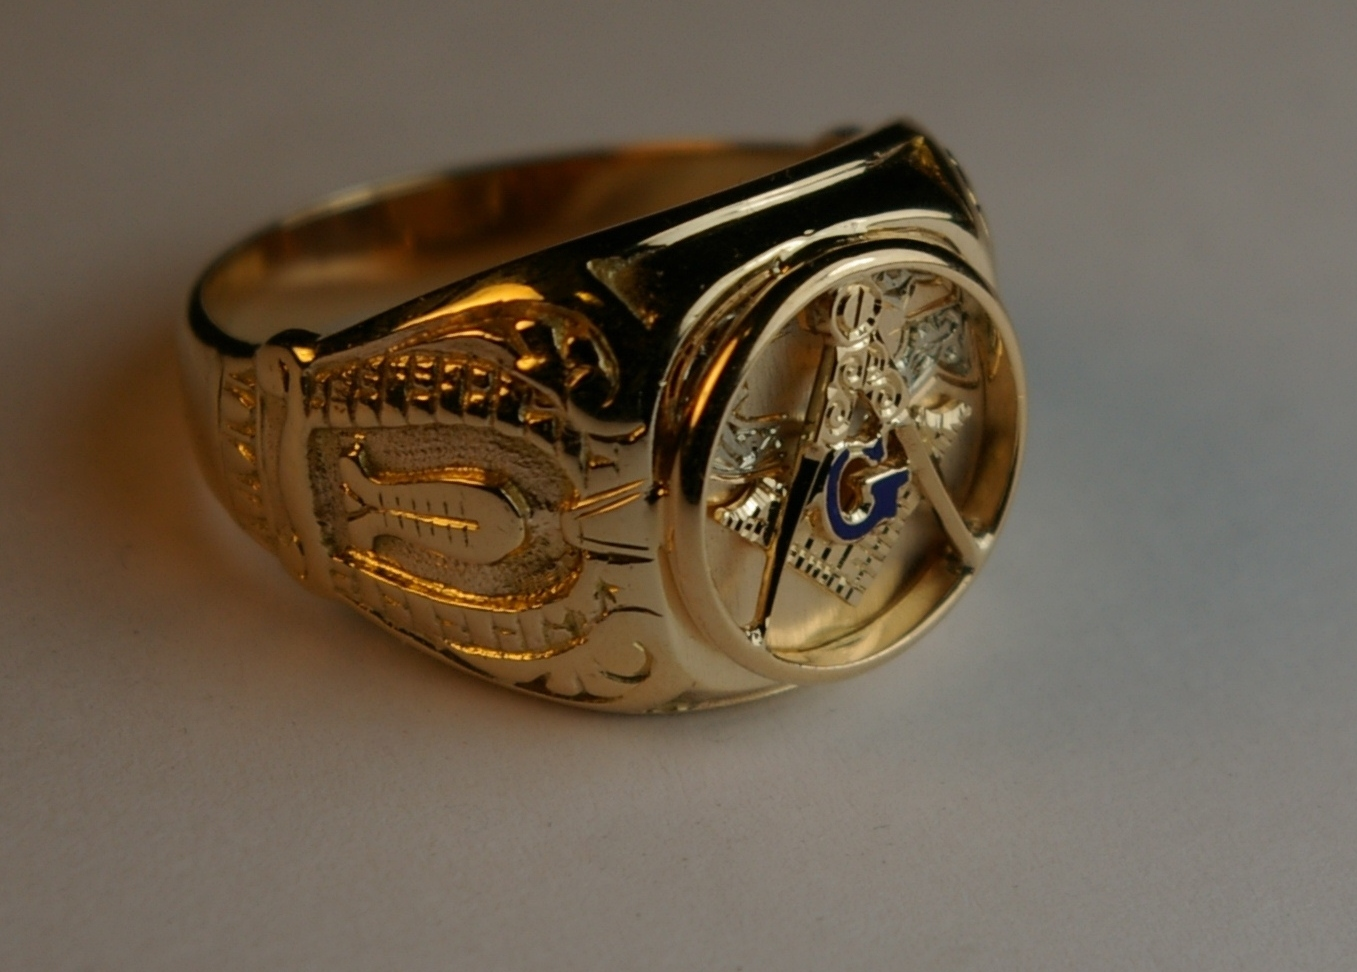 Masonic Ring after restoration